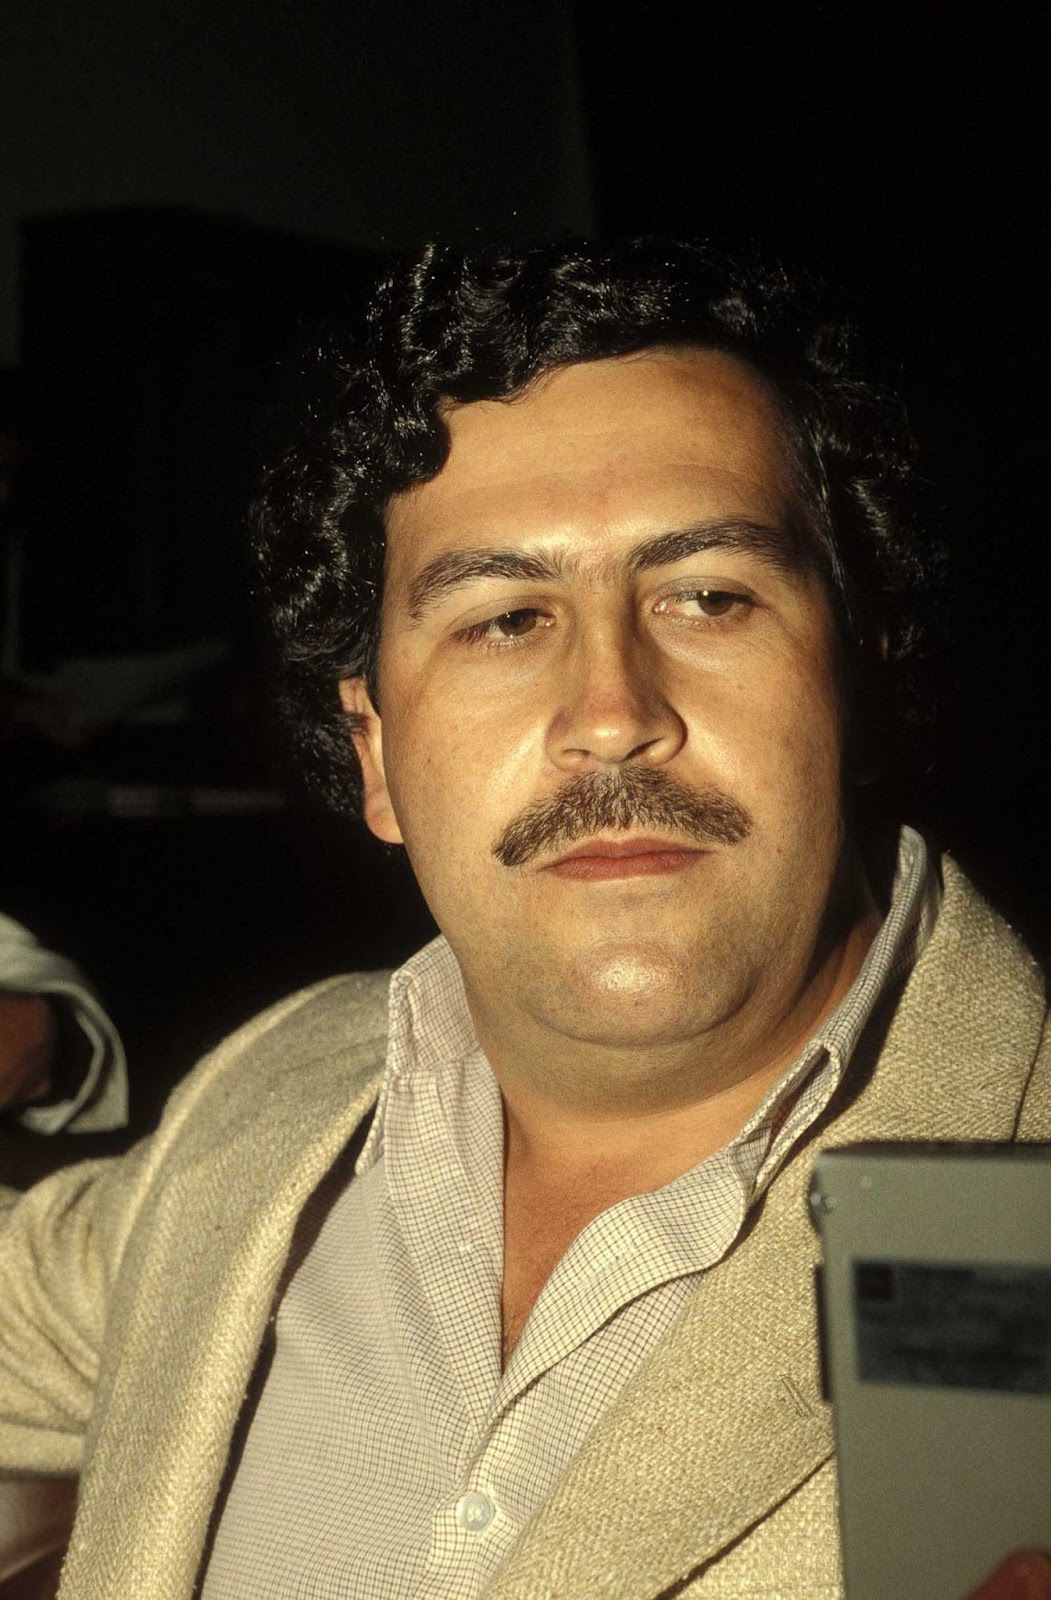 Pablo Escobar a la altura de su poder. 1988.